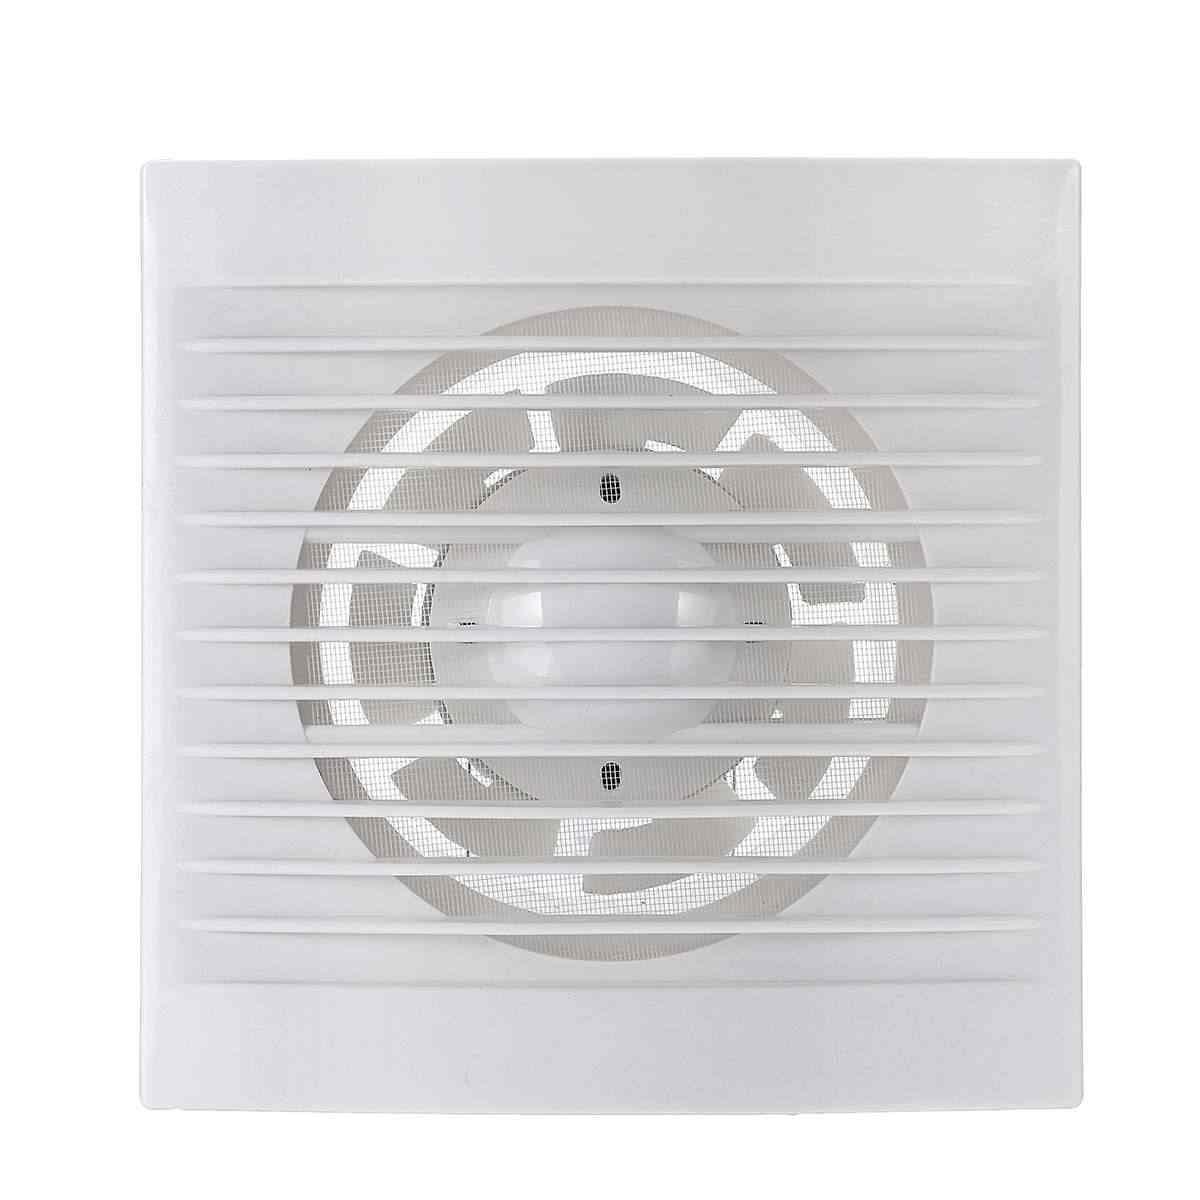 12 W 220 V 4/6 ''Auspuff Fan Wand Montiert Badezimmer Toiletten Belüftung Fans Geräuscharm Dunstabzugshaube für Küche air Vent